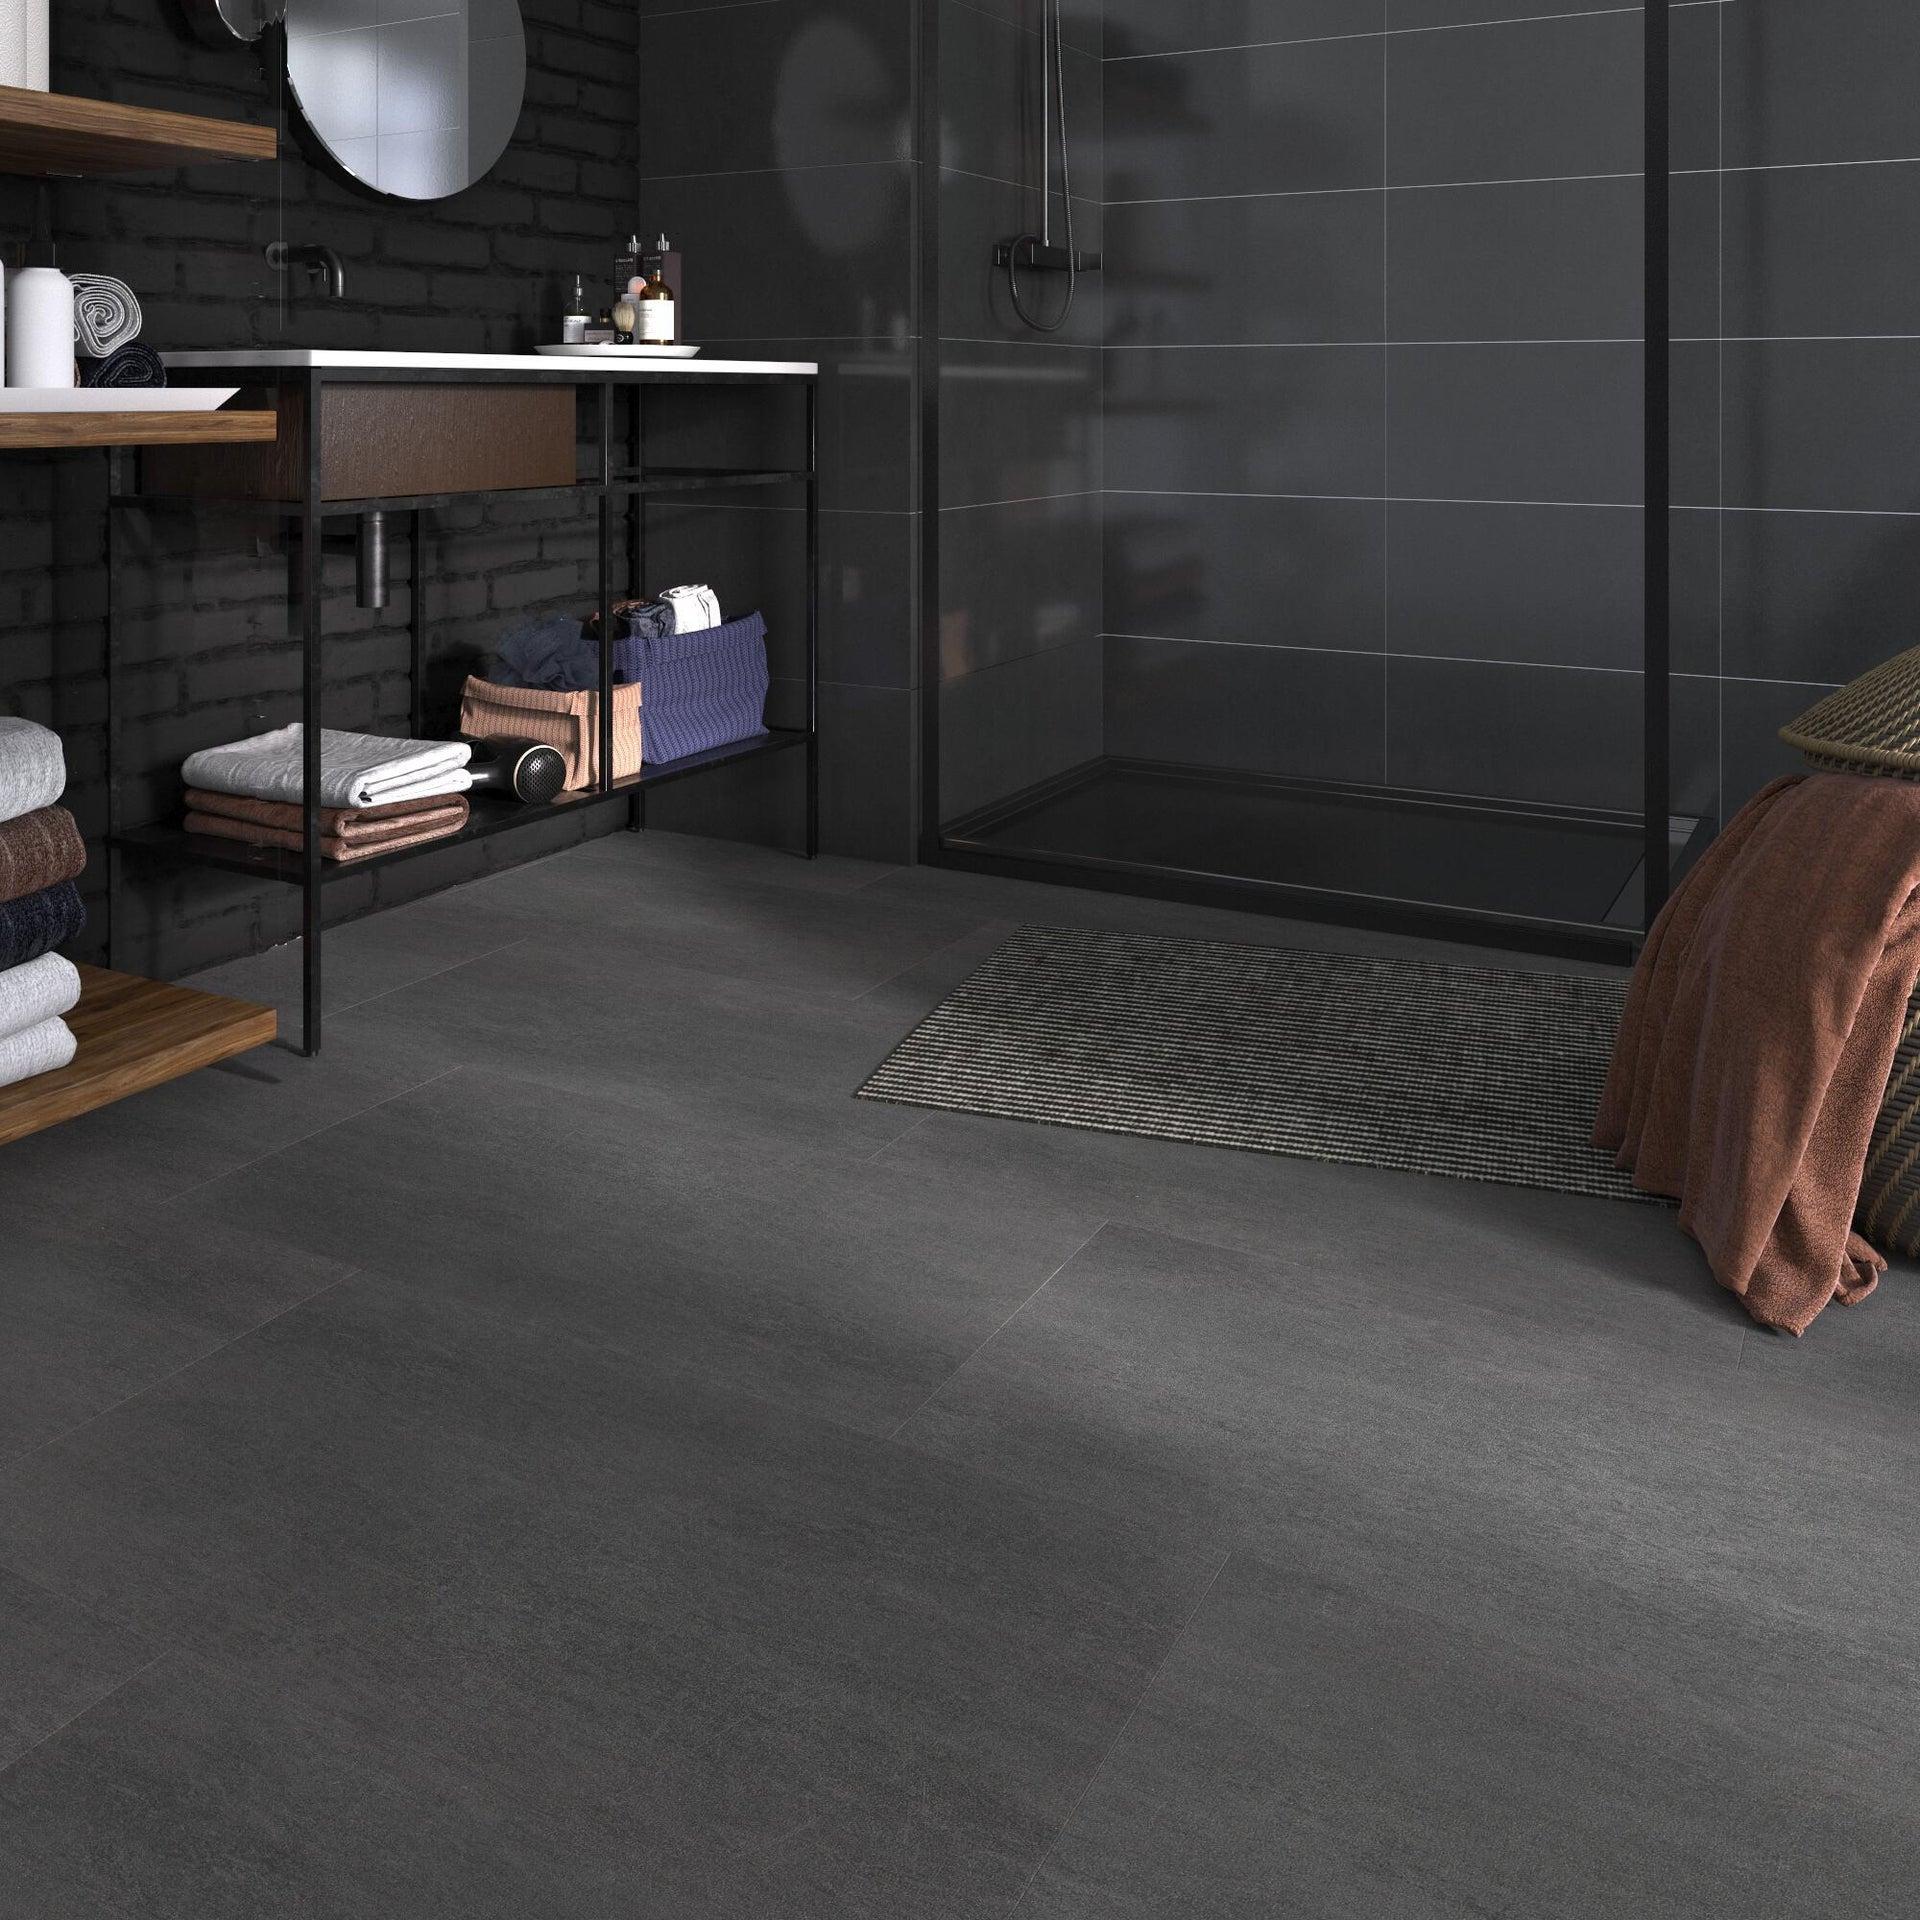 Pavimento PVC flottante clic+ Art For New Sp 4.2 mm nero - 6